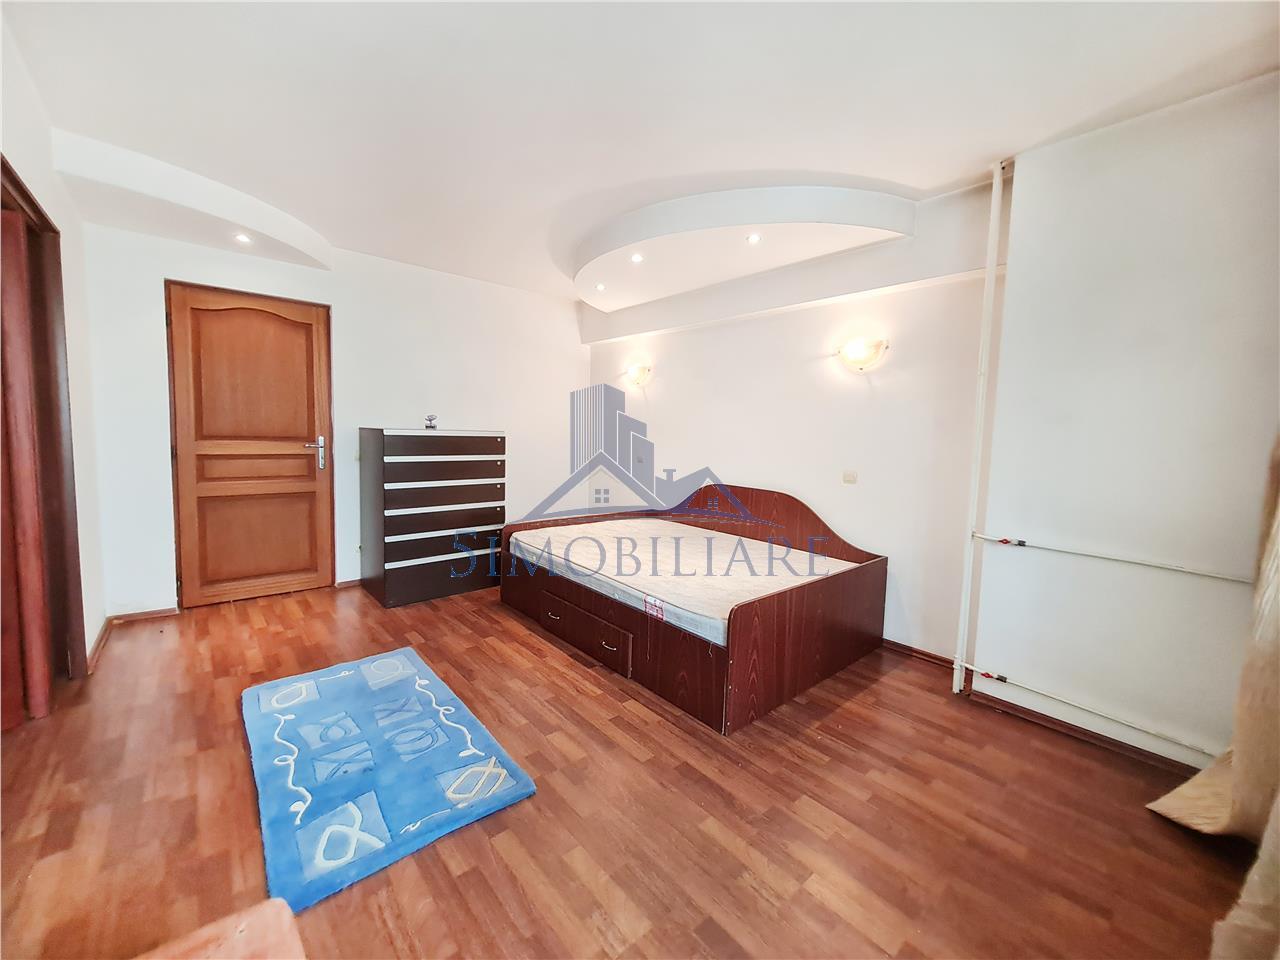 Apartament 4 camere de inchiriat Calea Mosilor.